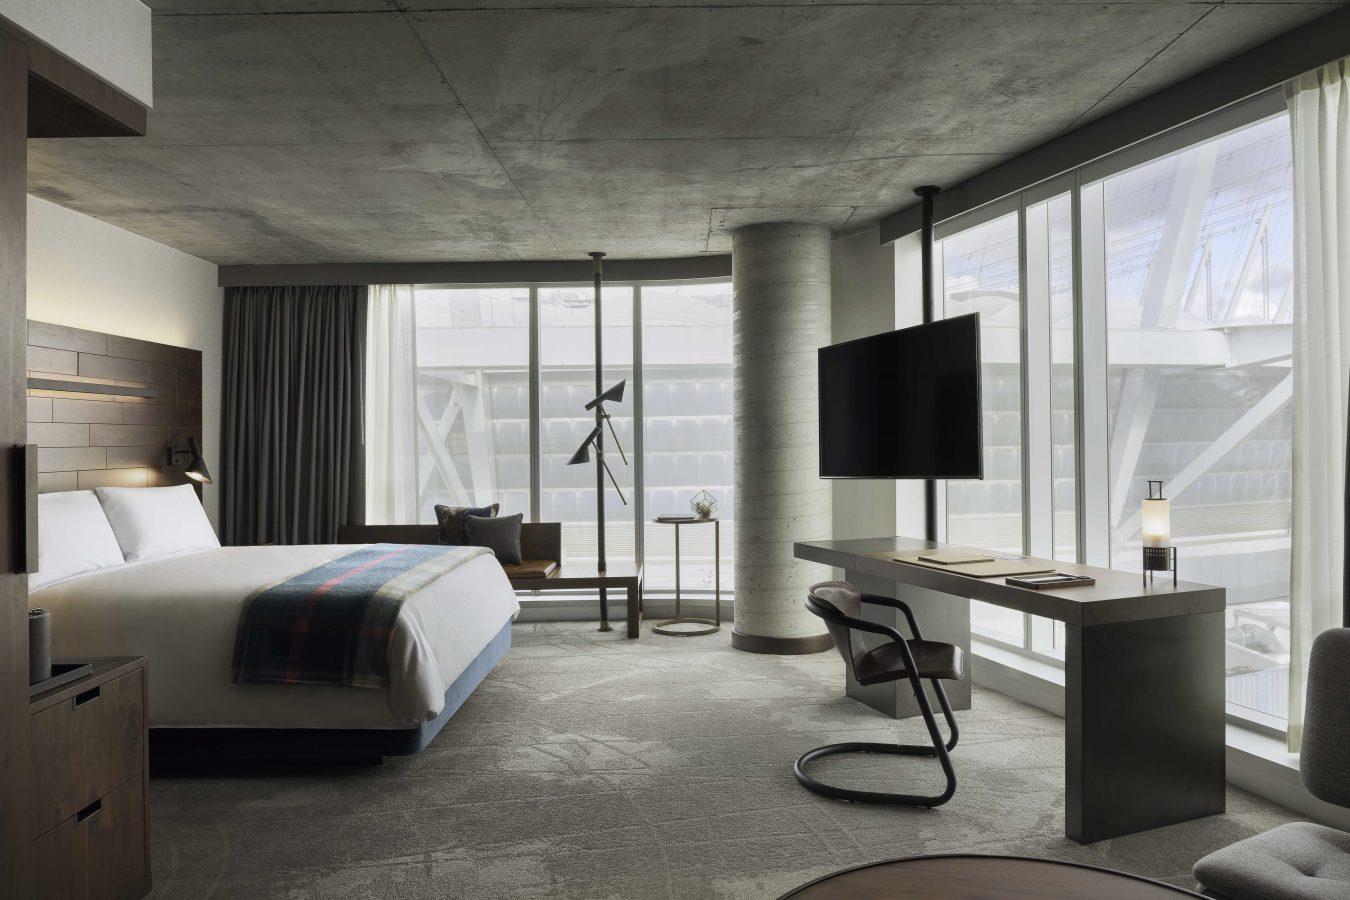 Parq vancouver montecristo for Design hotel vancouver